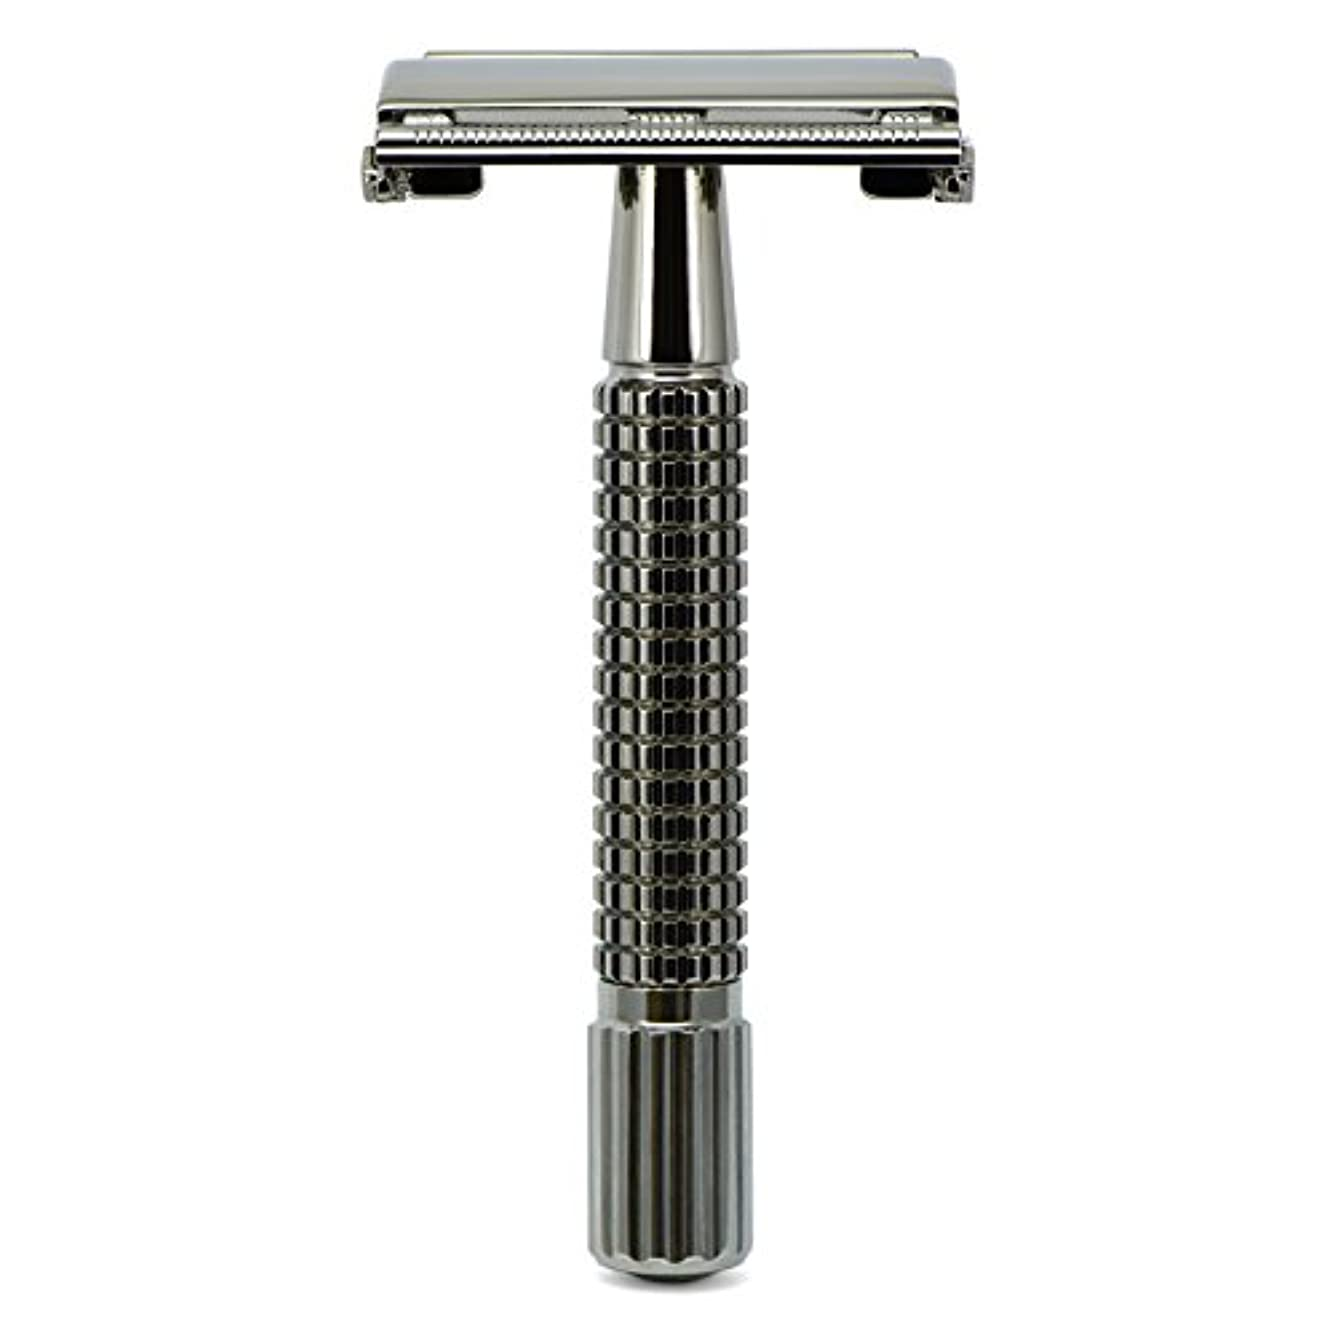 G&F - Gentle Shaver Safety razor, Butterfly, black chrome, 8 cm